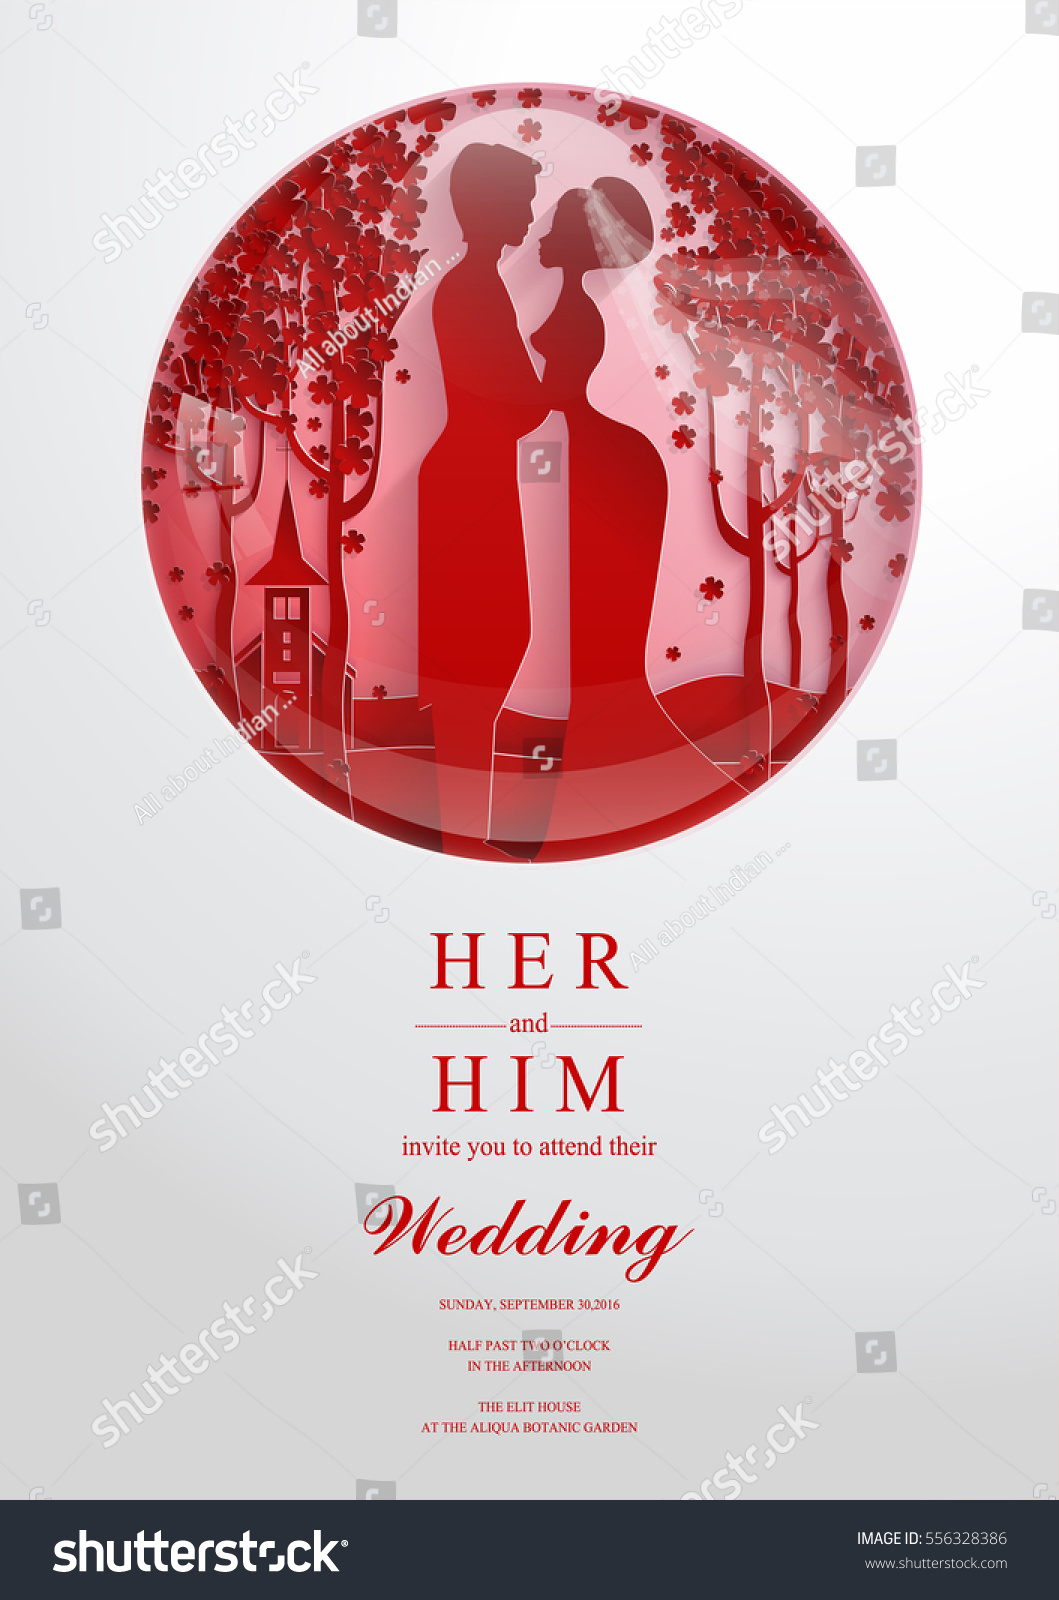 Wedding Invitation Card Templates Paper Art Stock Vector (Royalty ...